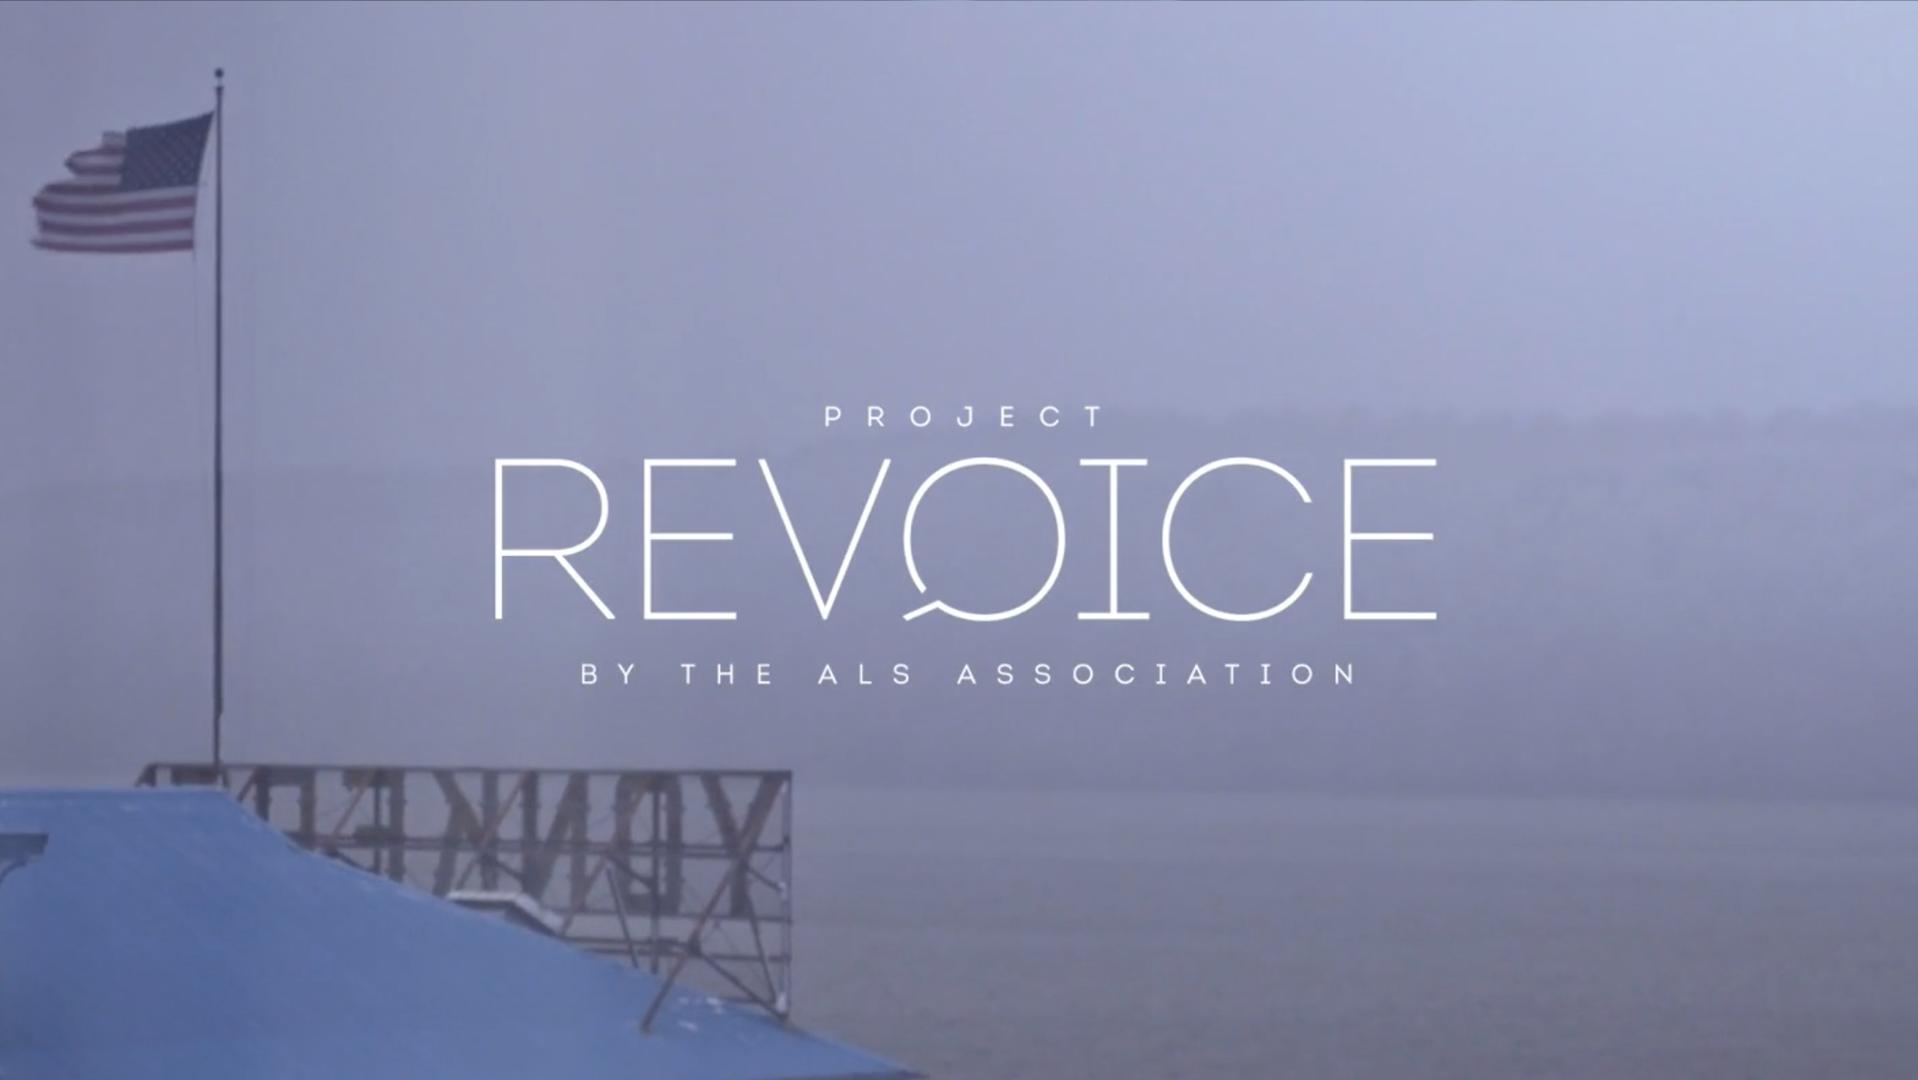 Project Revoice - Avant-Garde/Innovative